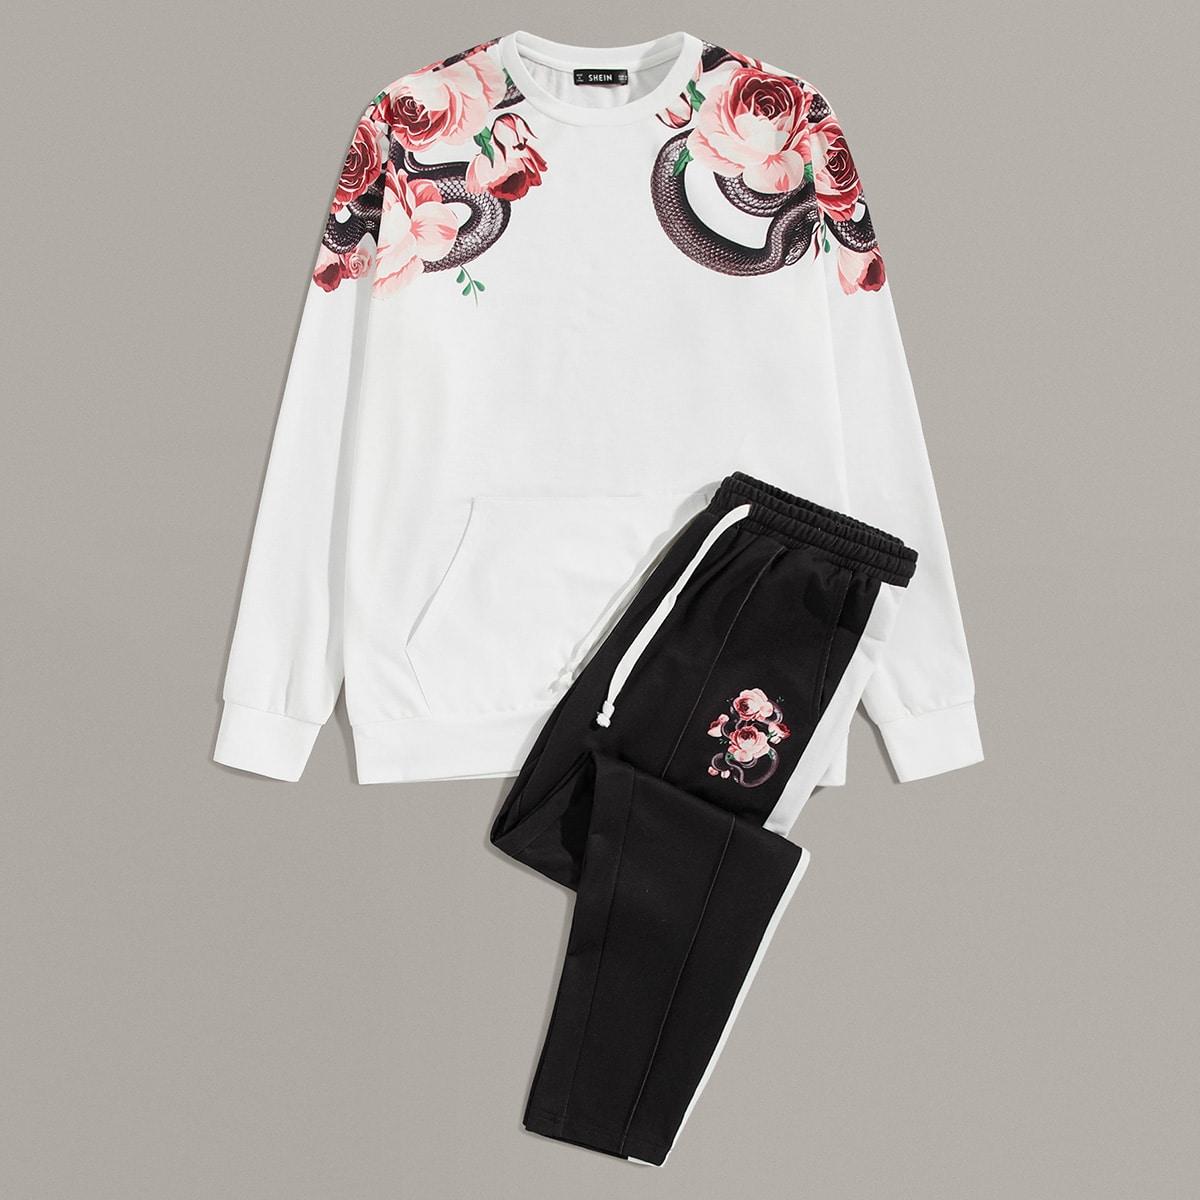 Mannen Snake en Bloemen Pullover & Gestreepte Side broek Set